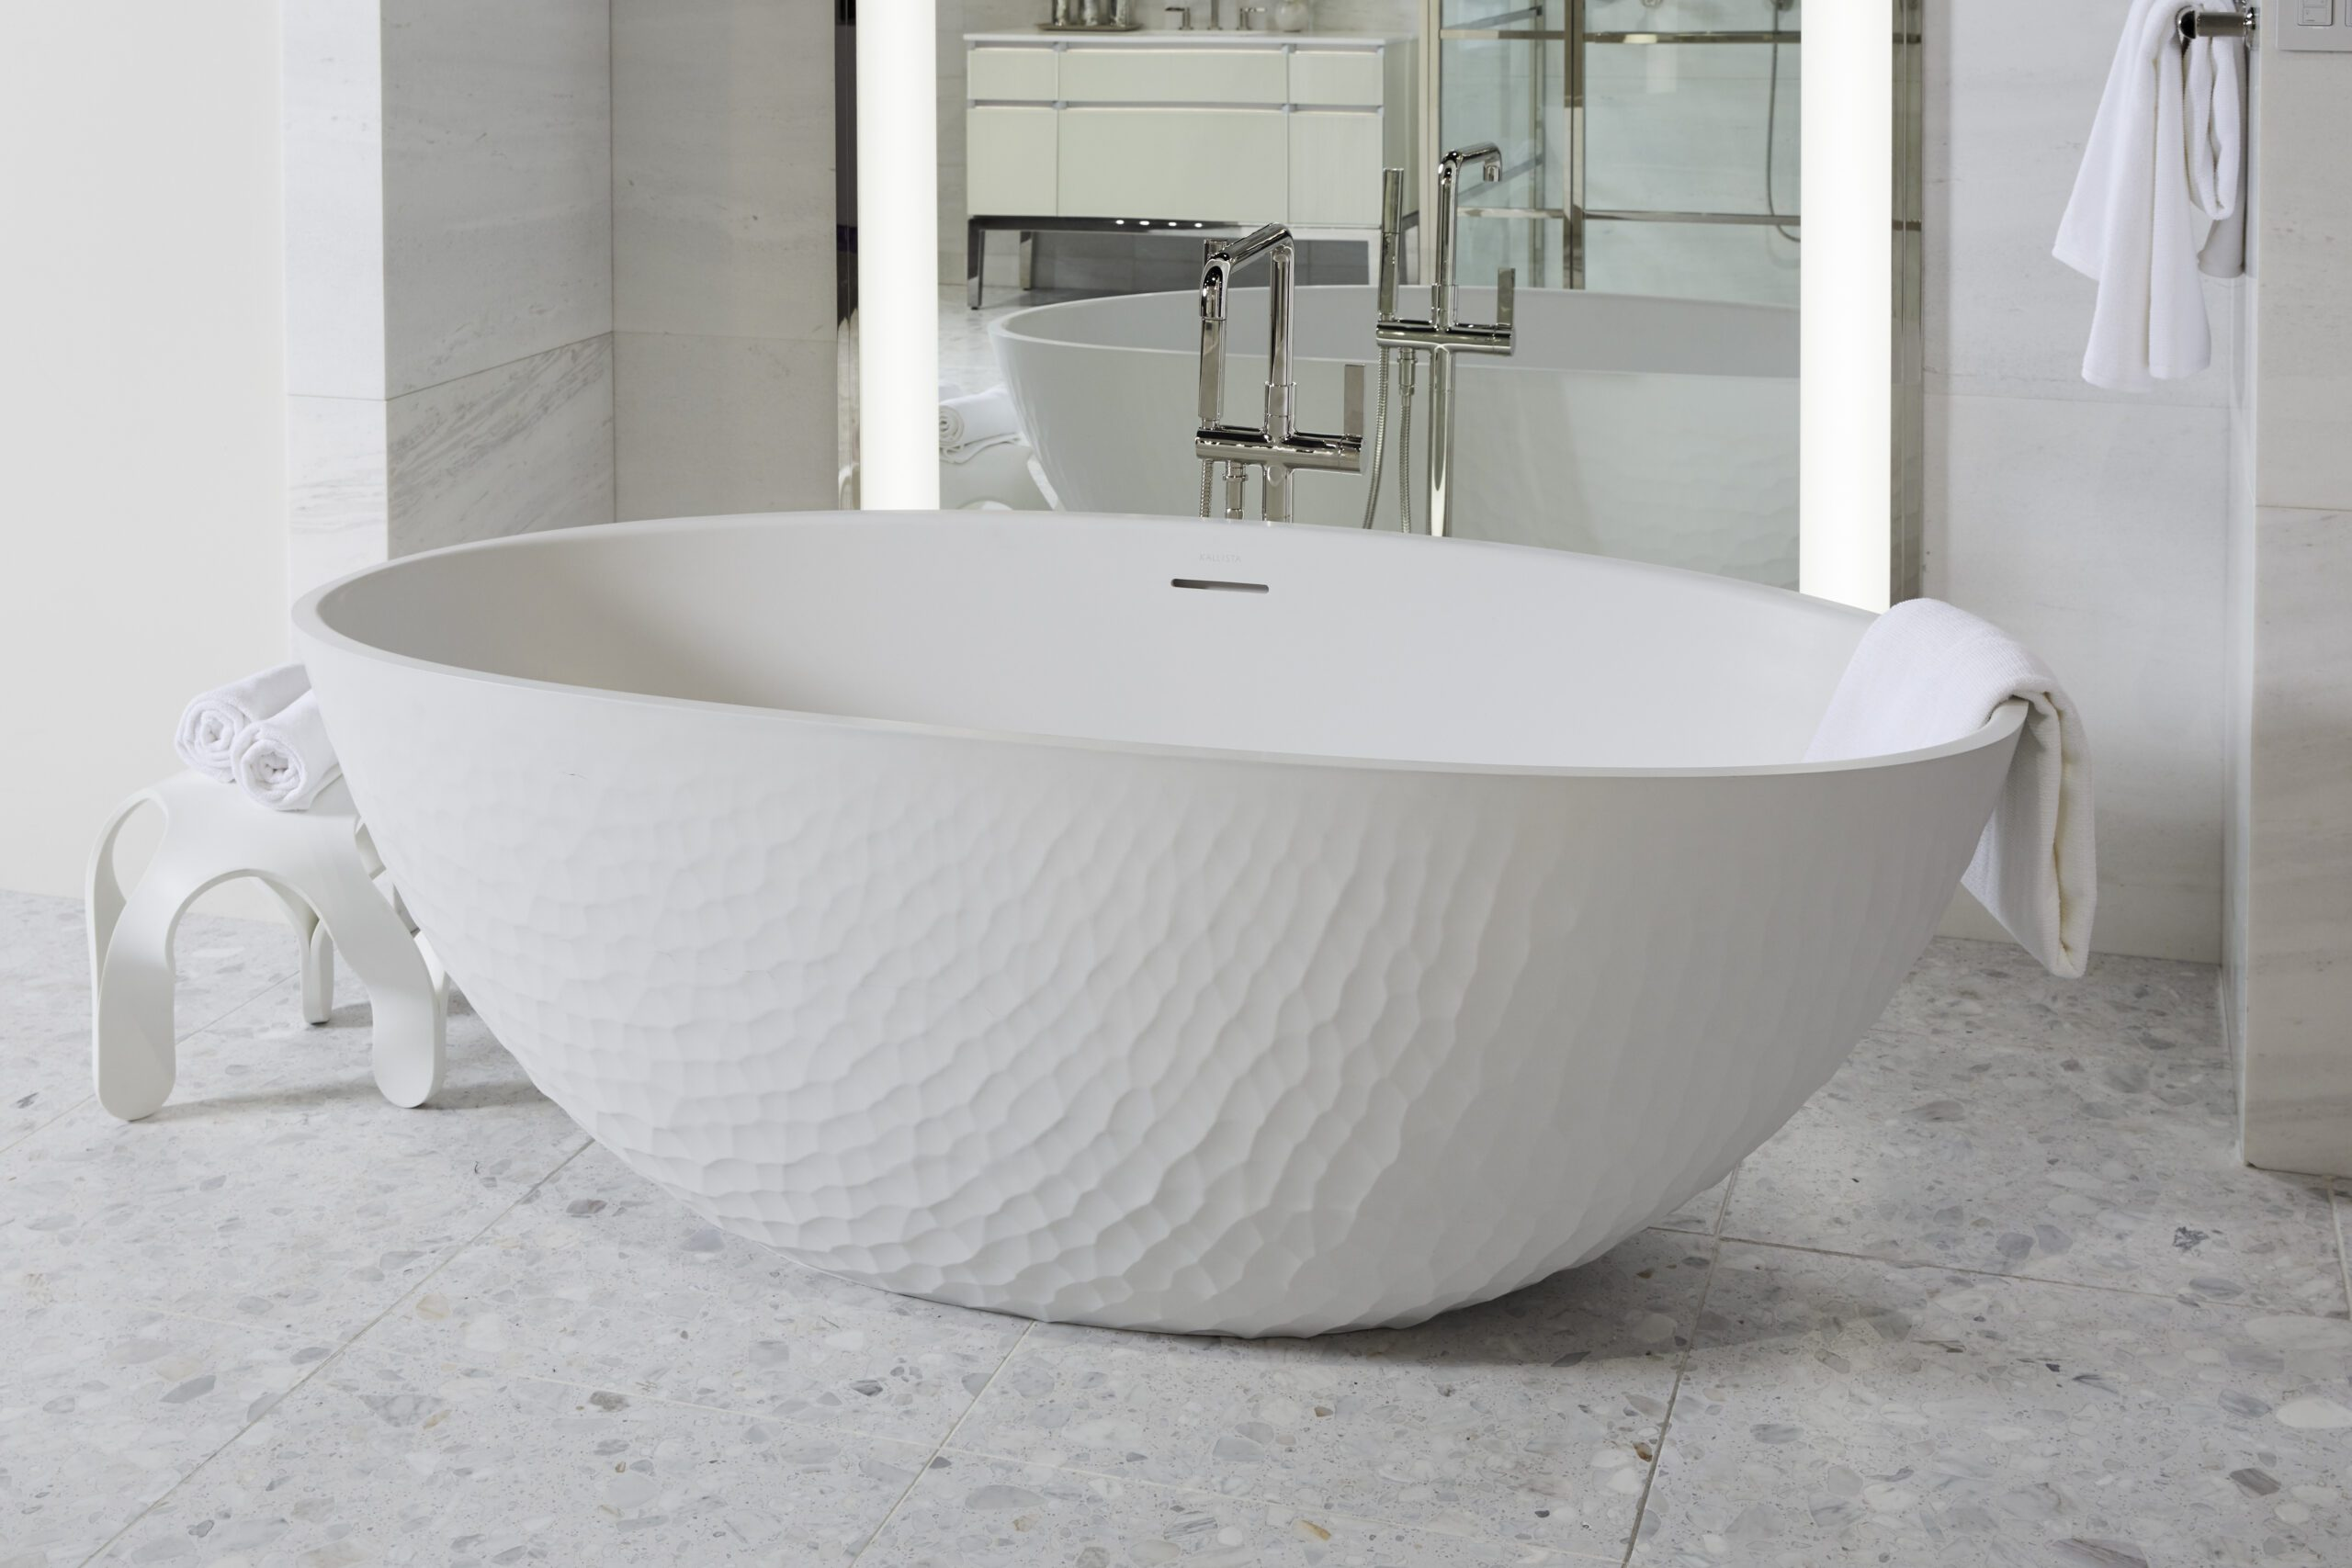 Argile Freestanding Bathtub